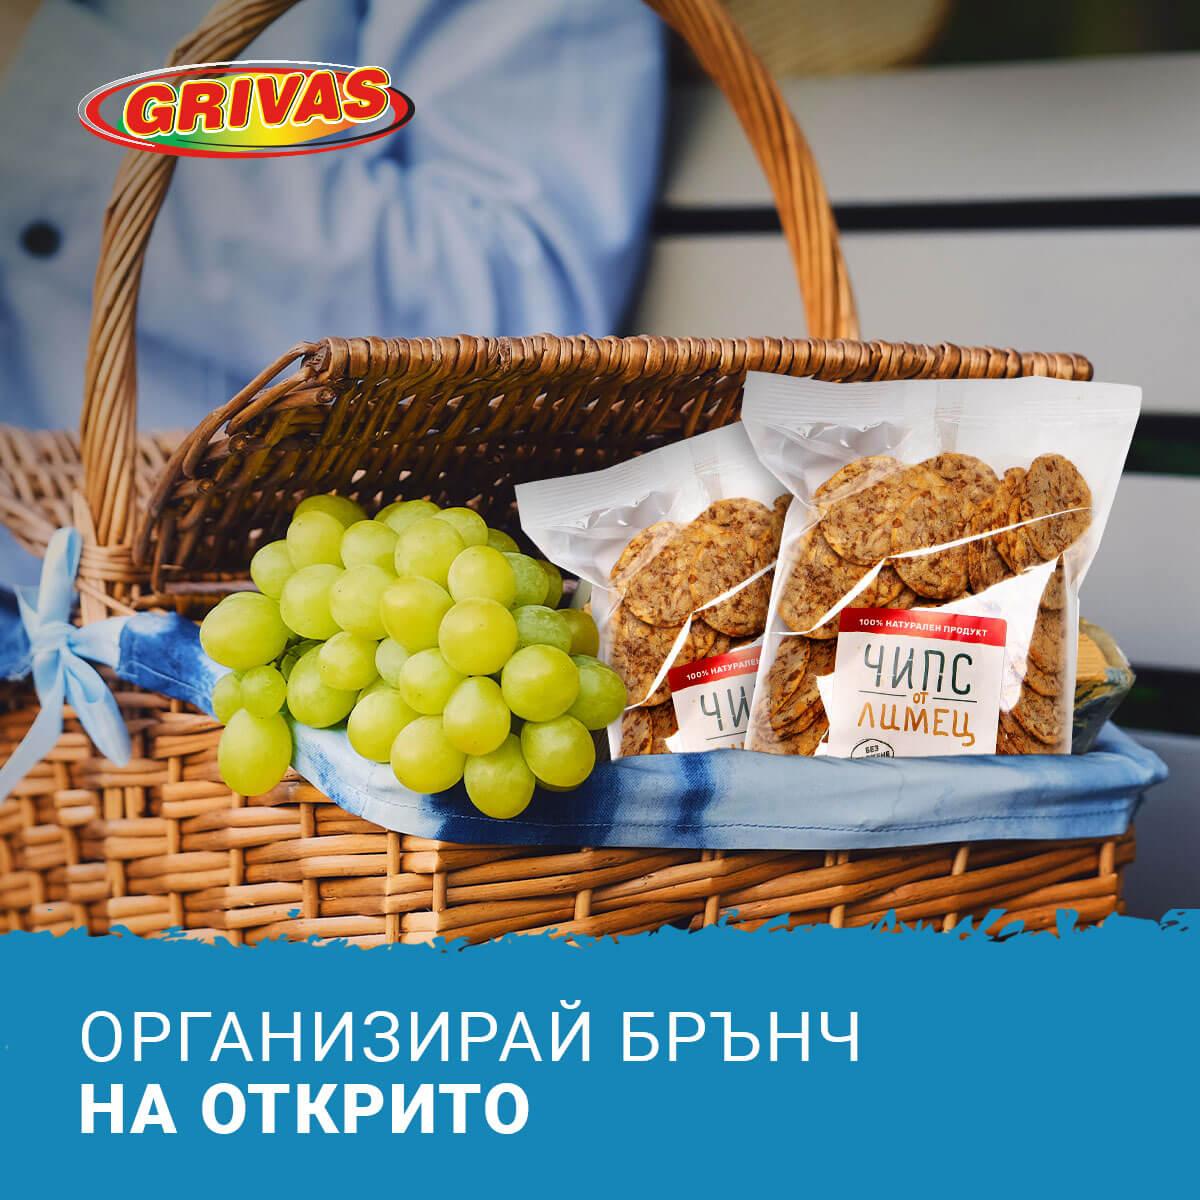 grivas-blog-post1